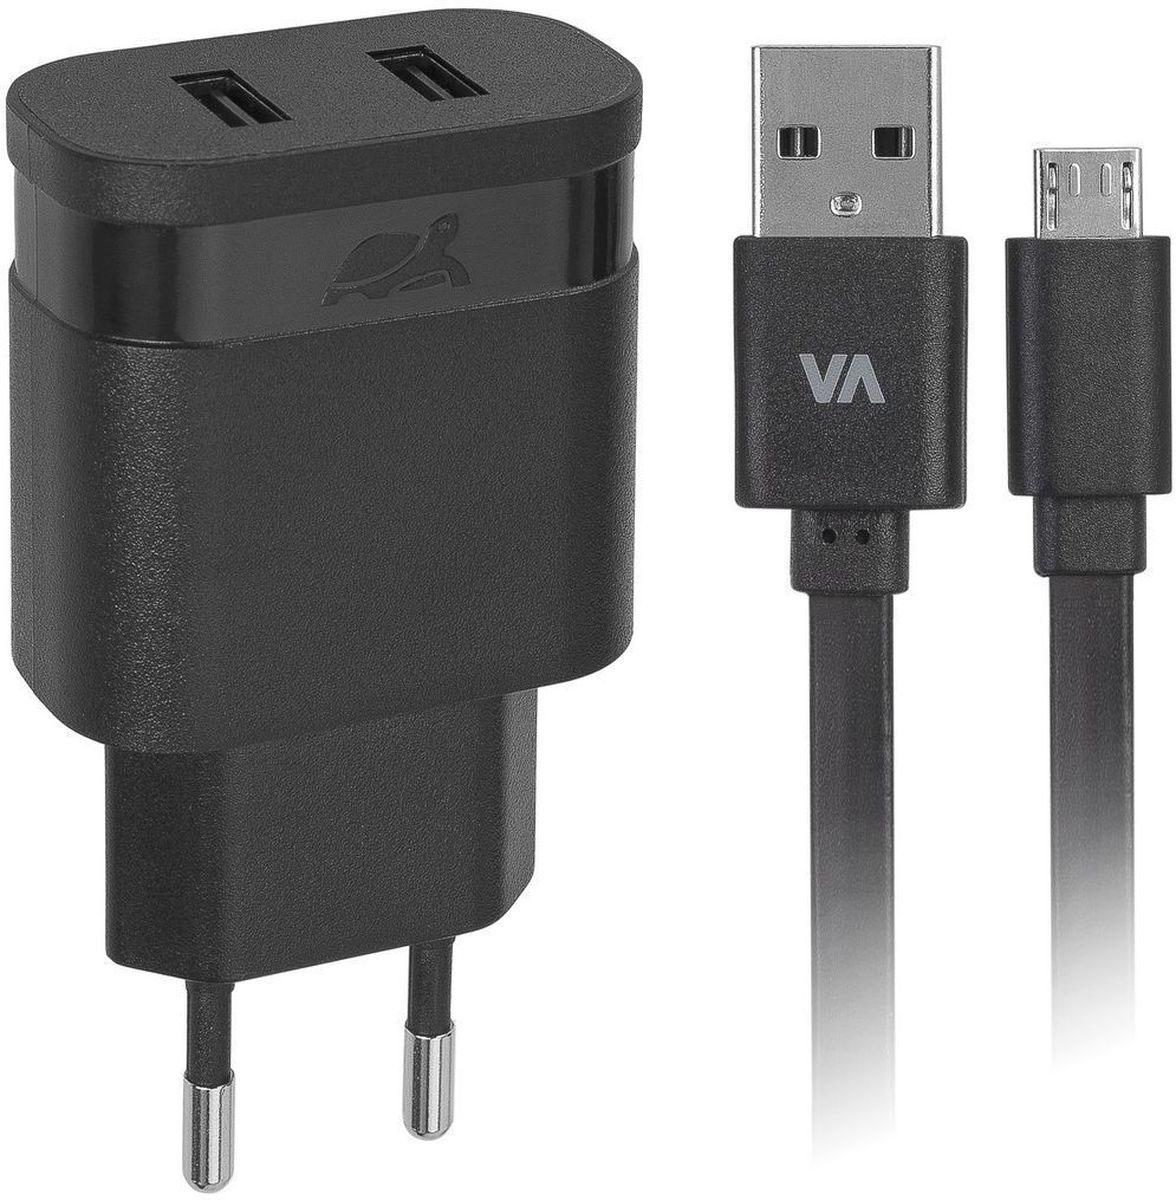 Rivapower VA4122 BD1, Black сетевое зарядное устройство rivapower va4122 w00 white сетевое зарядное устройство